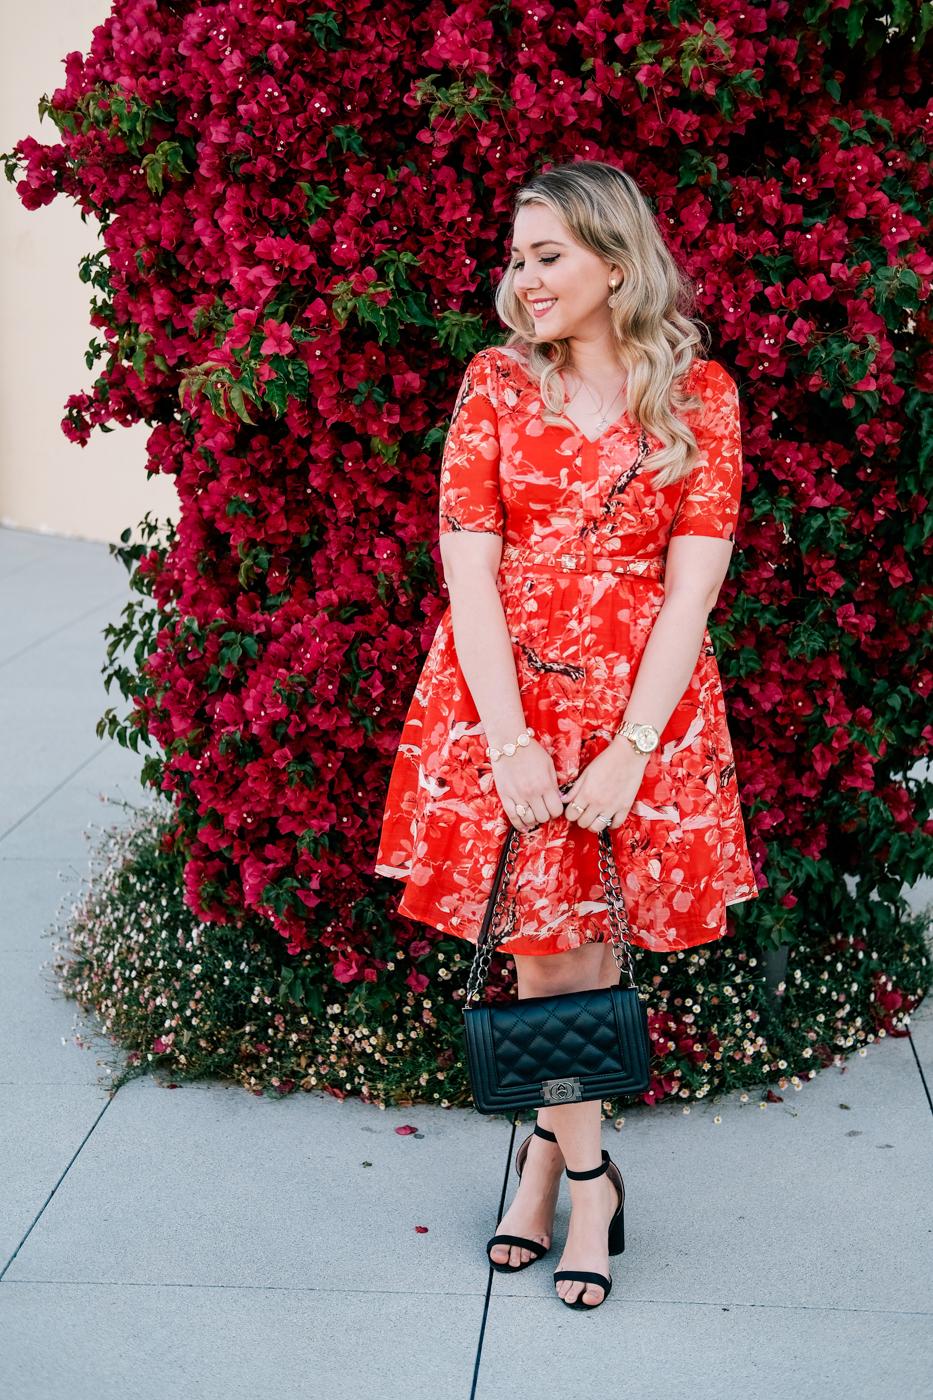 Debora Dahl, ladylike style, red dress